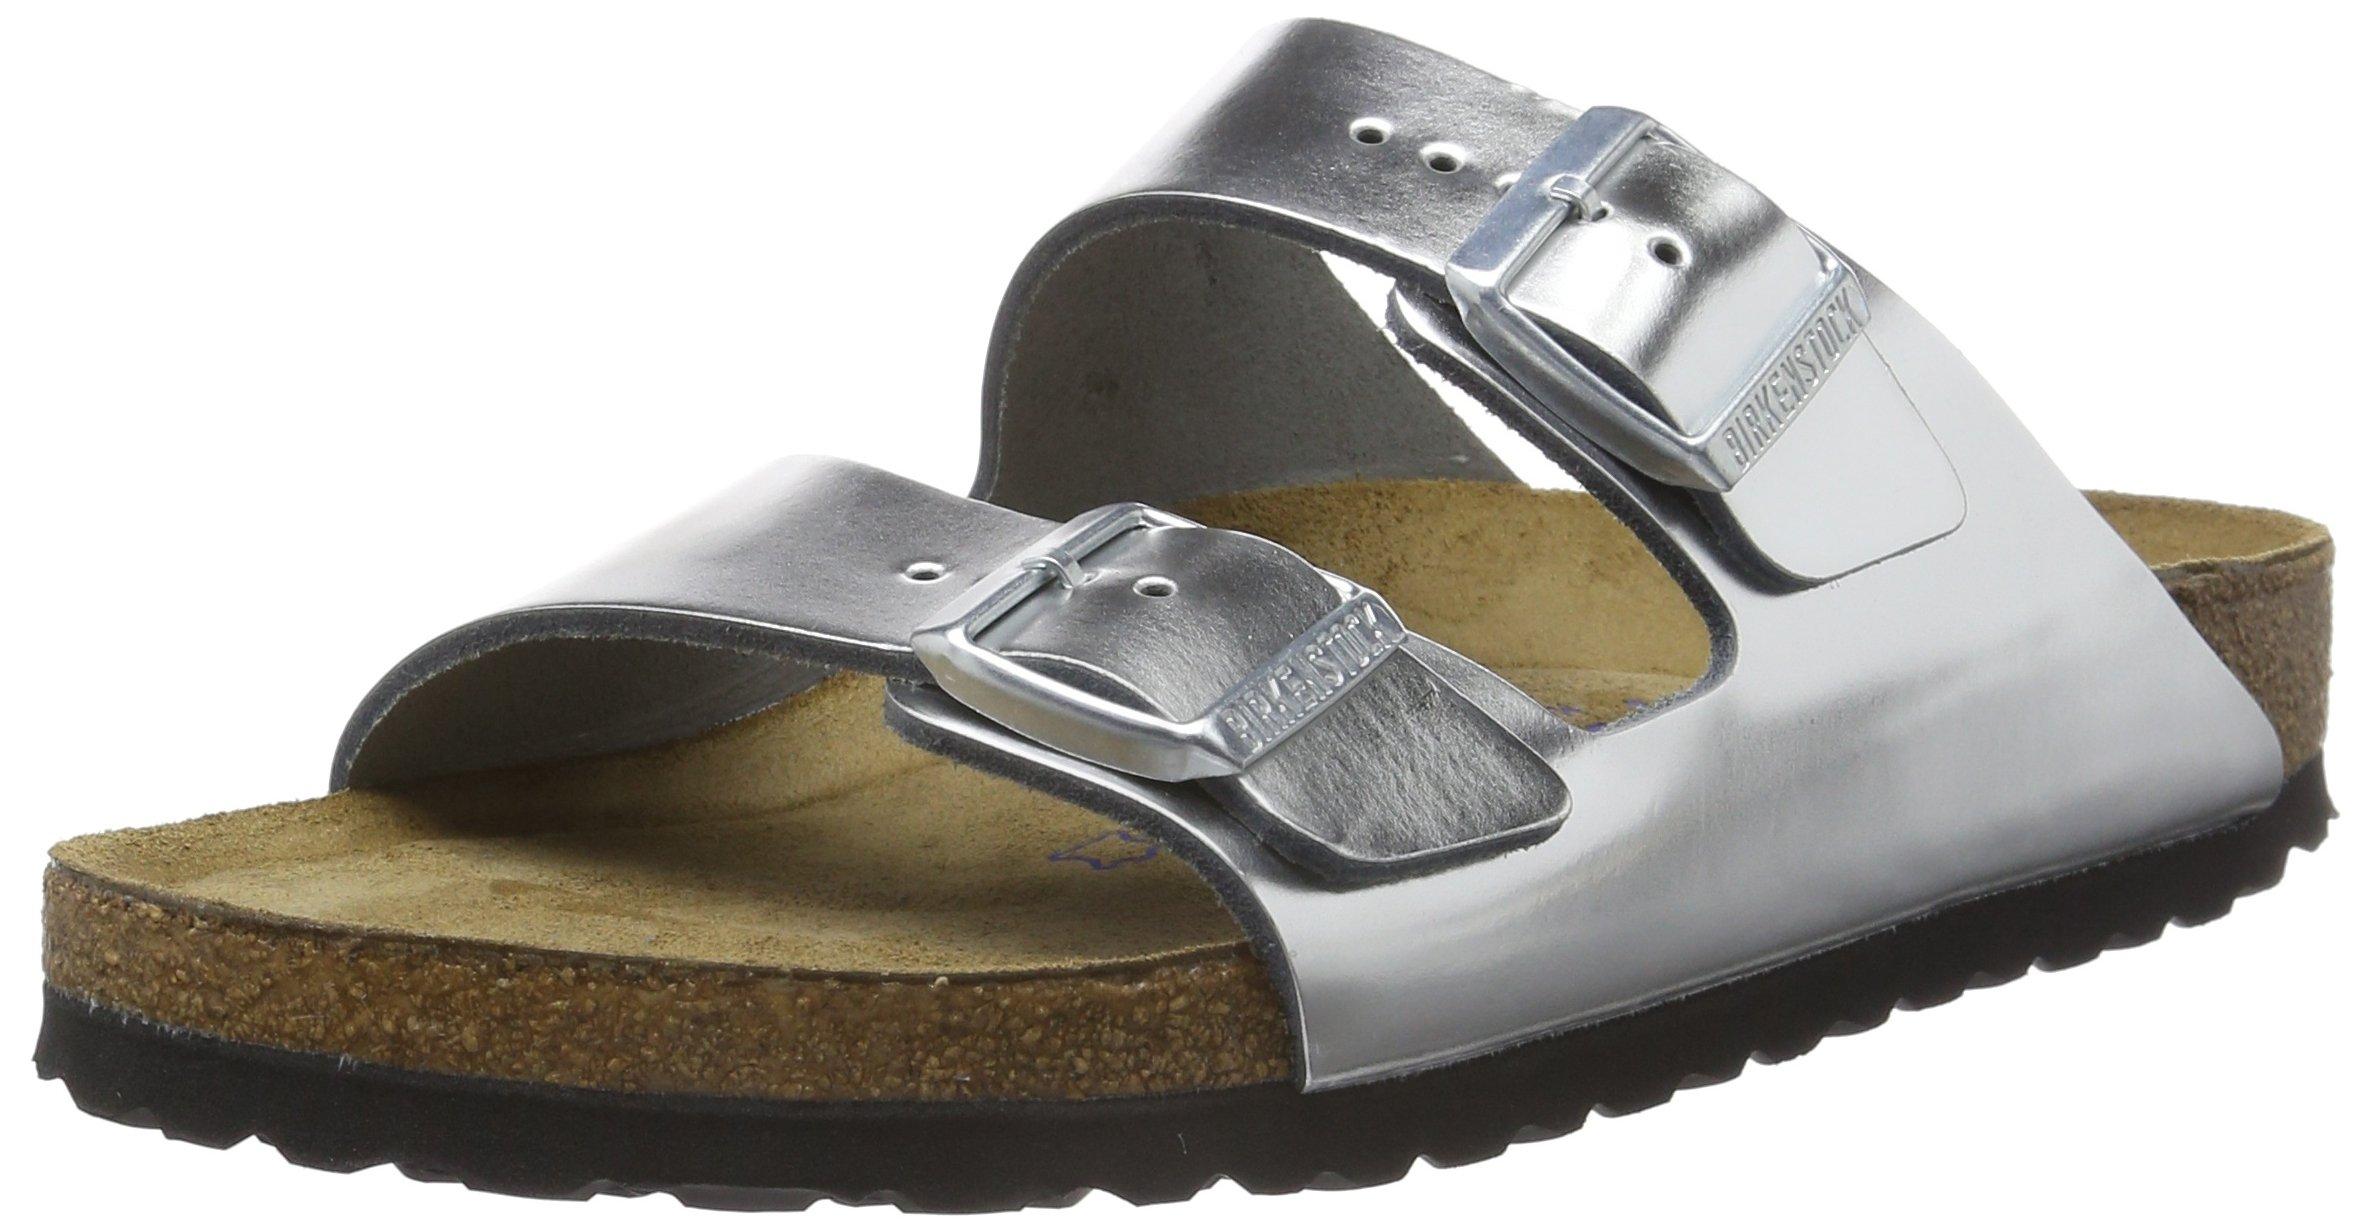 Birkenstock womens Arizona in Metallic Silver from Leather Sandals 39.0 EU N